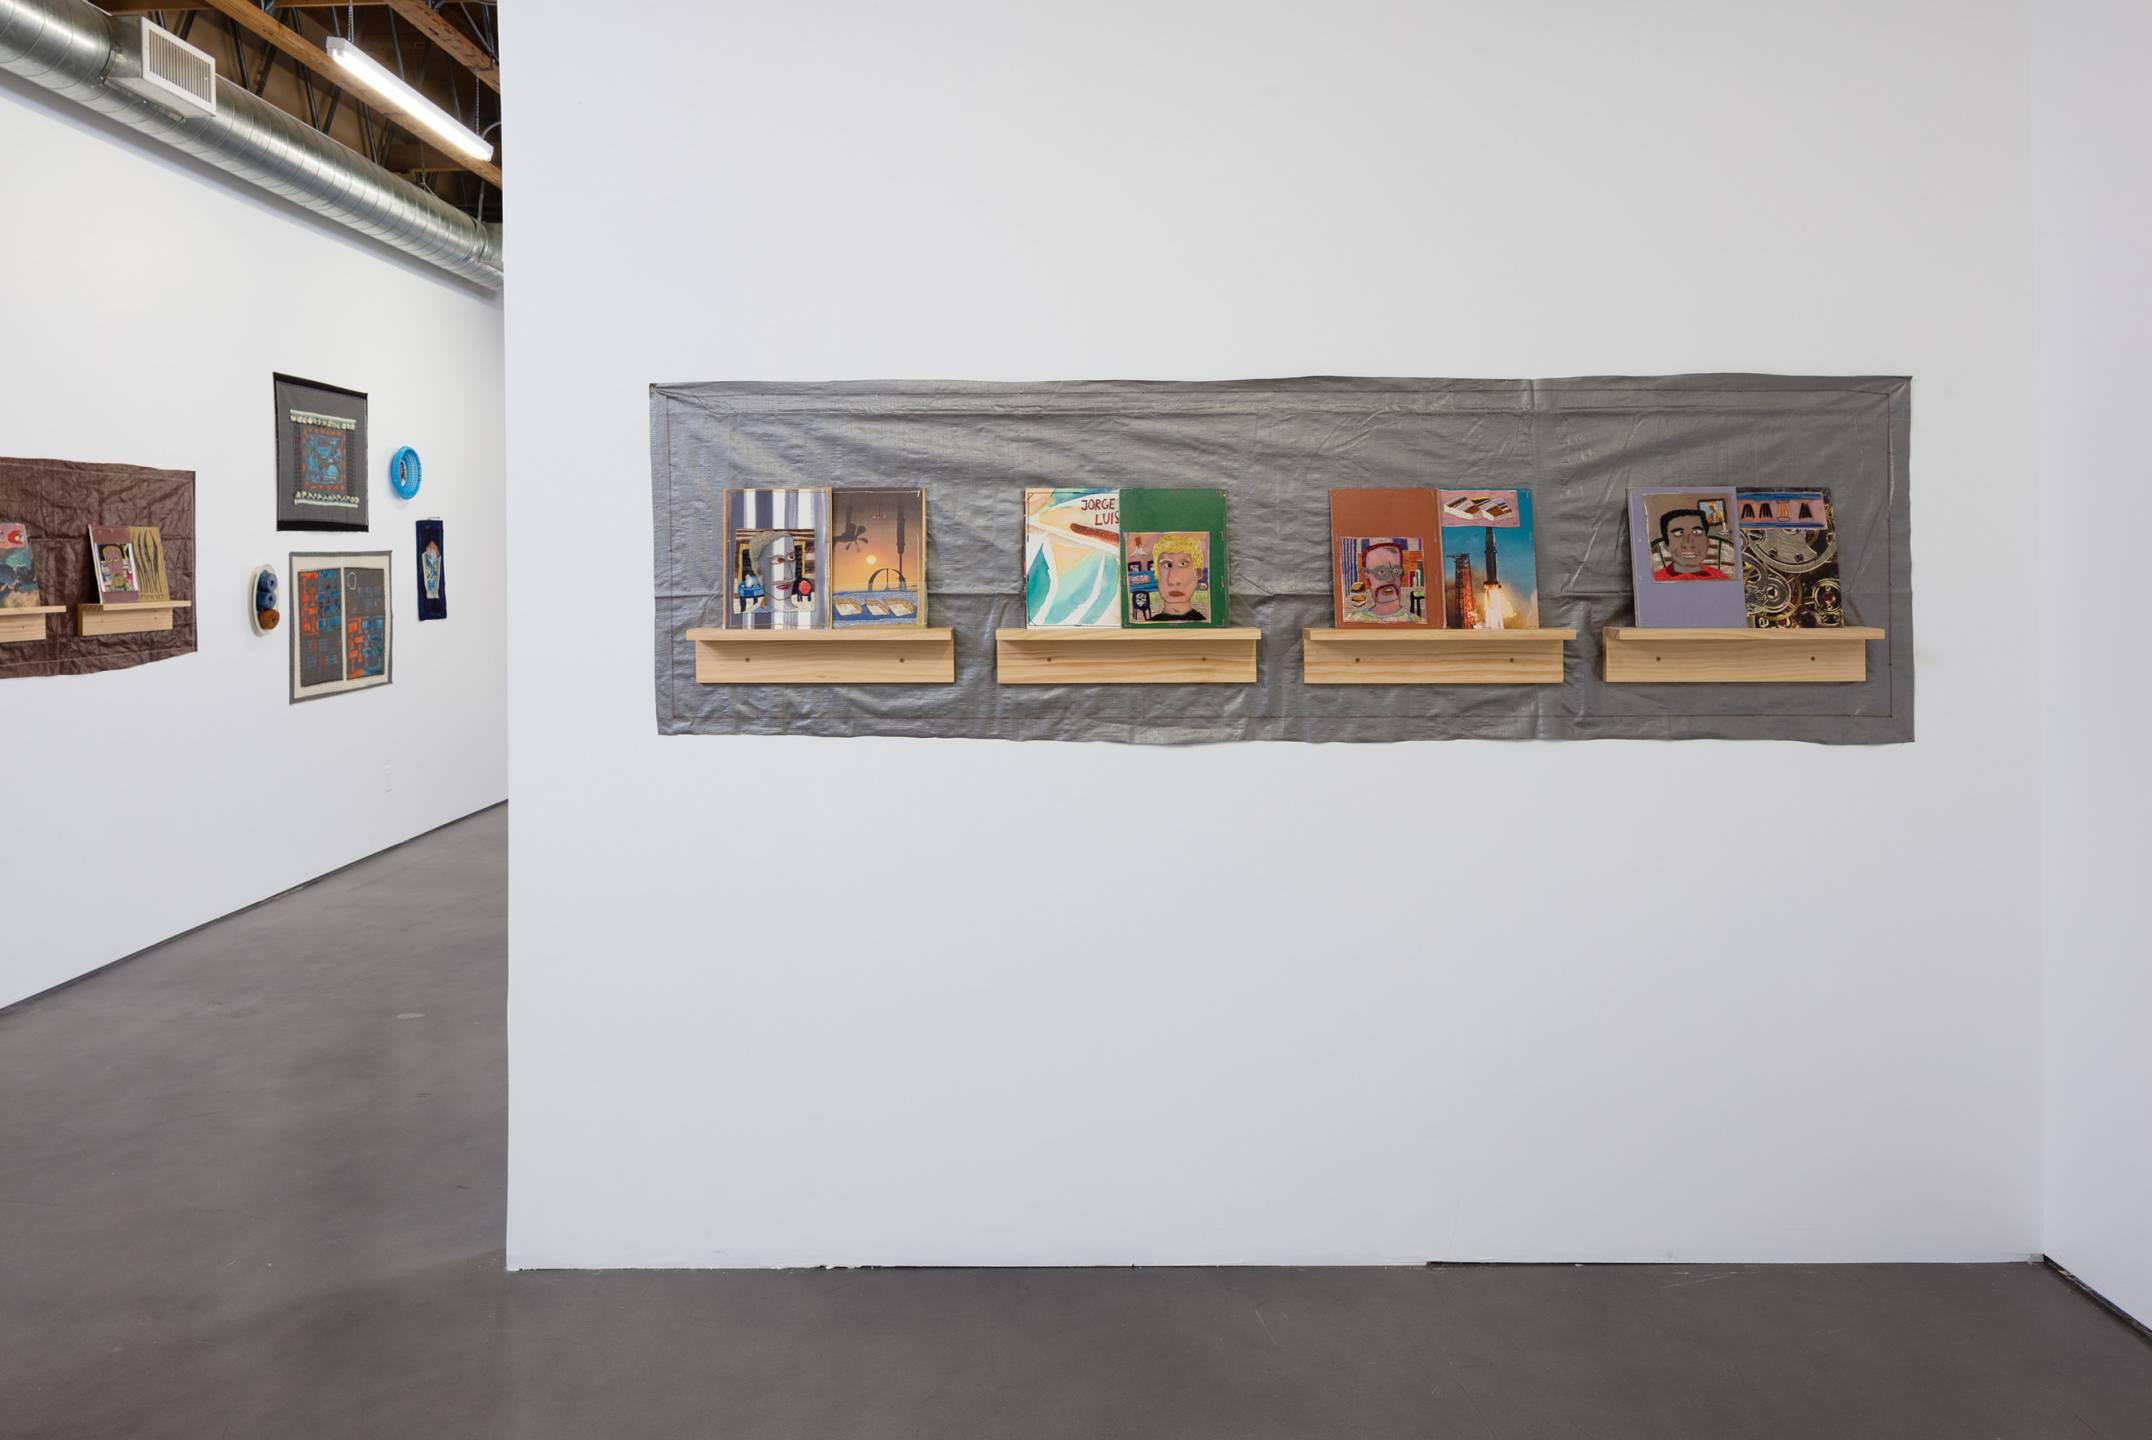 f.marquespenteado,<em>Guess Who's Coming to Dinner?</em>, Freedman Fitzpatrick, Los Angeles, 2017 - Mendes Wood DM